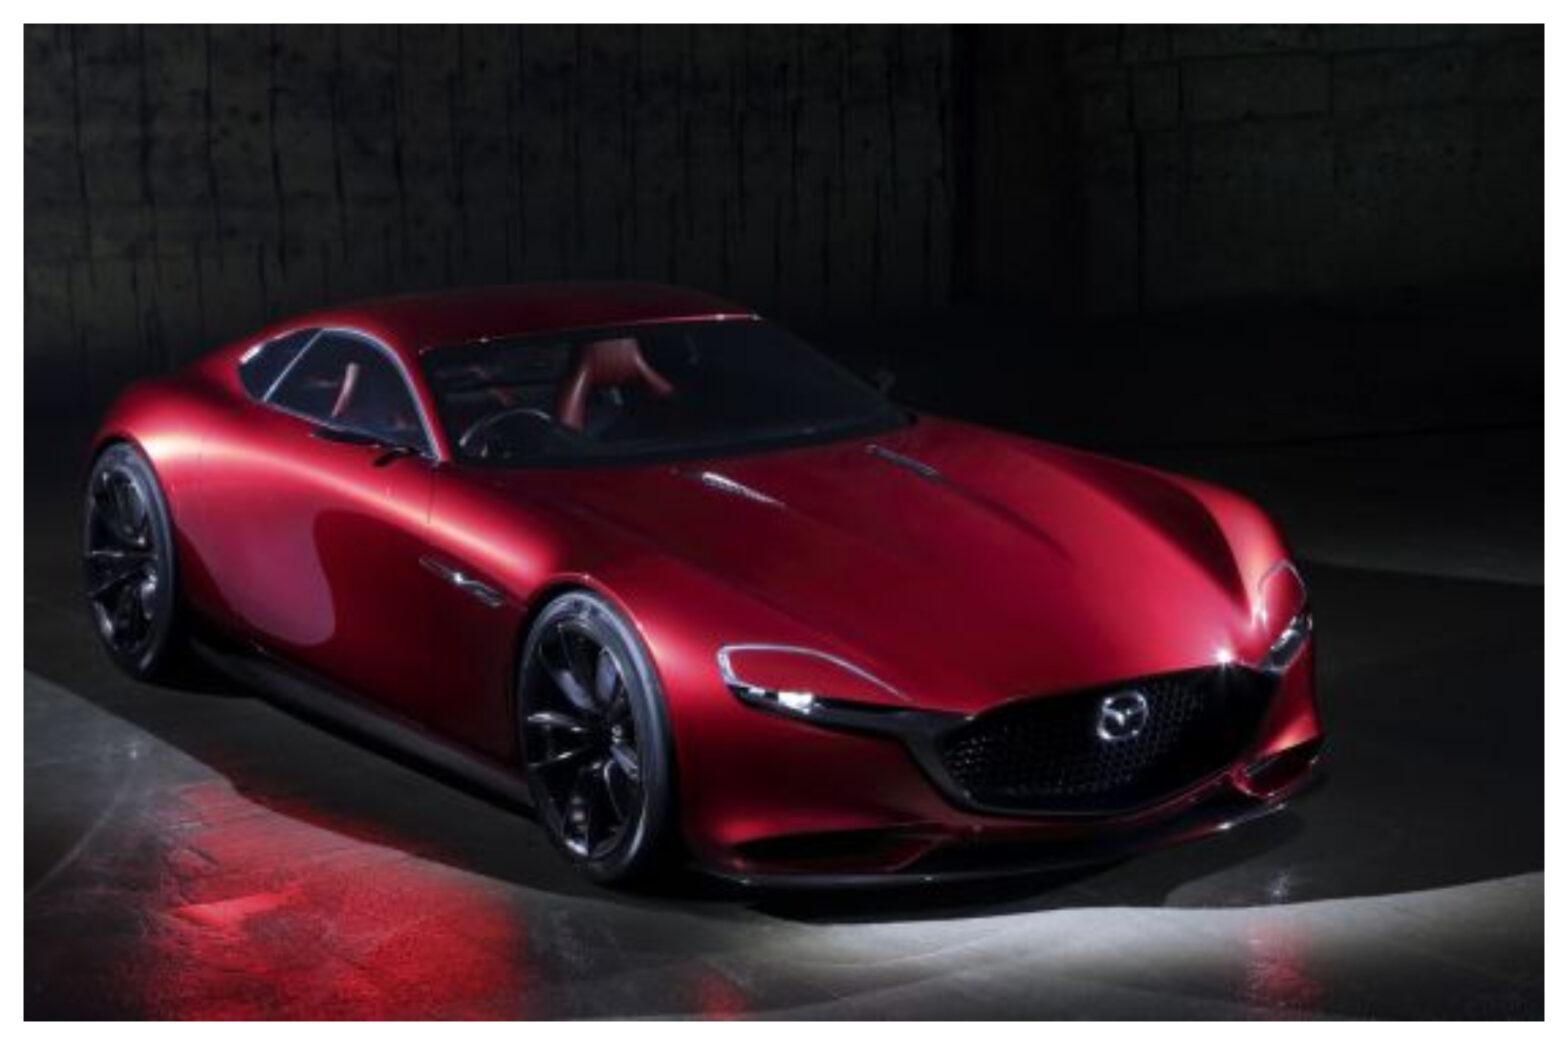 RX-7 歴史と待望の復活へ!現在の中古車価格は?【日本の名車】